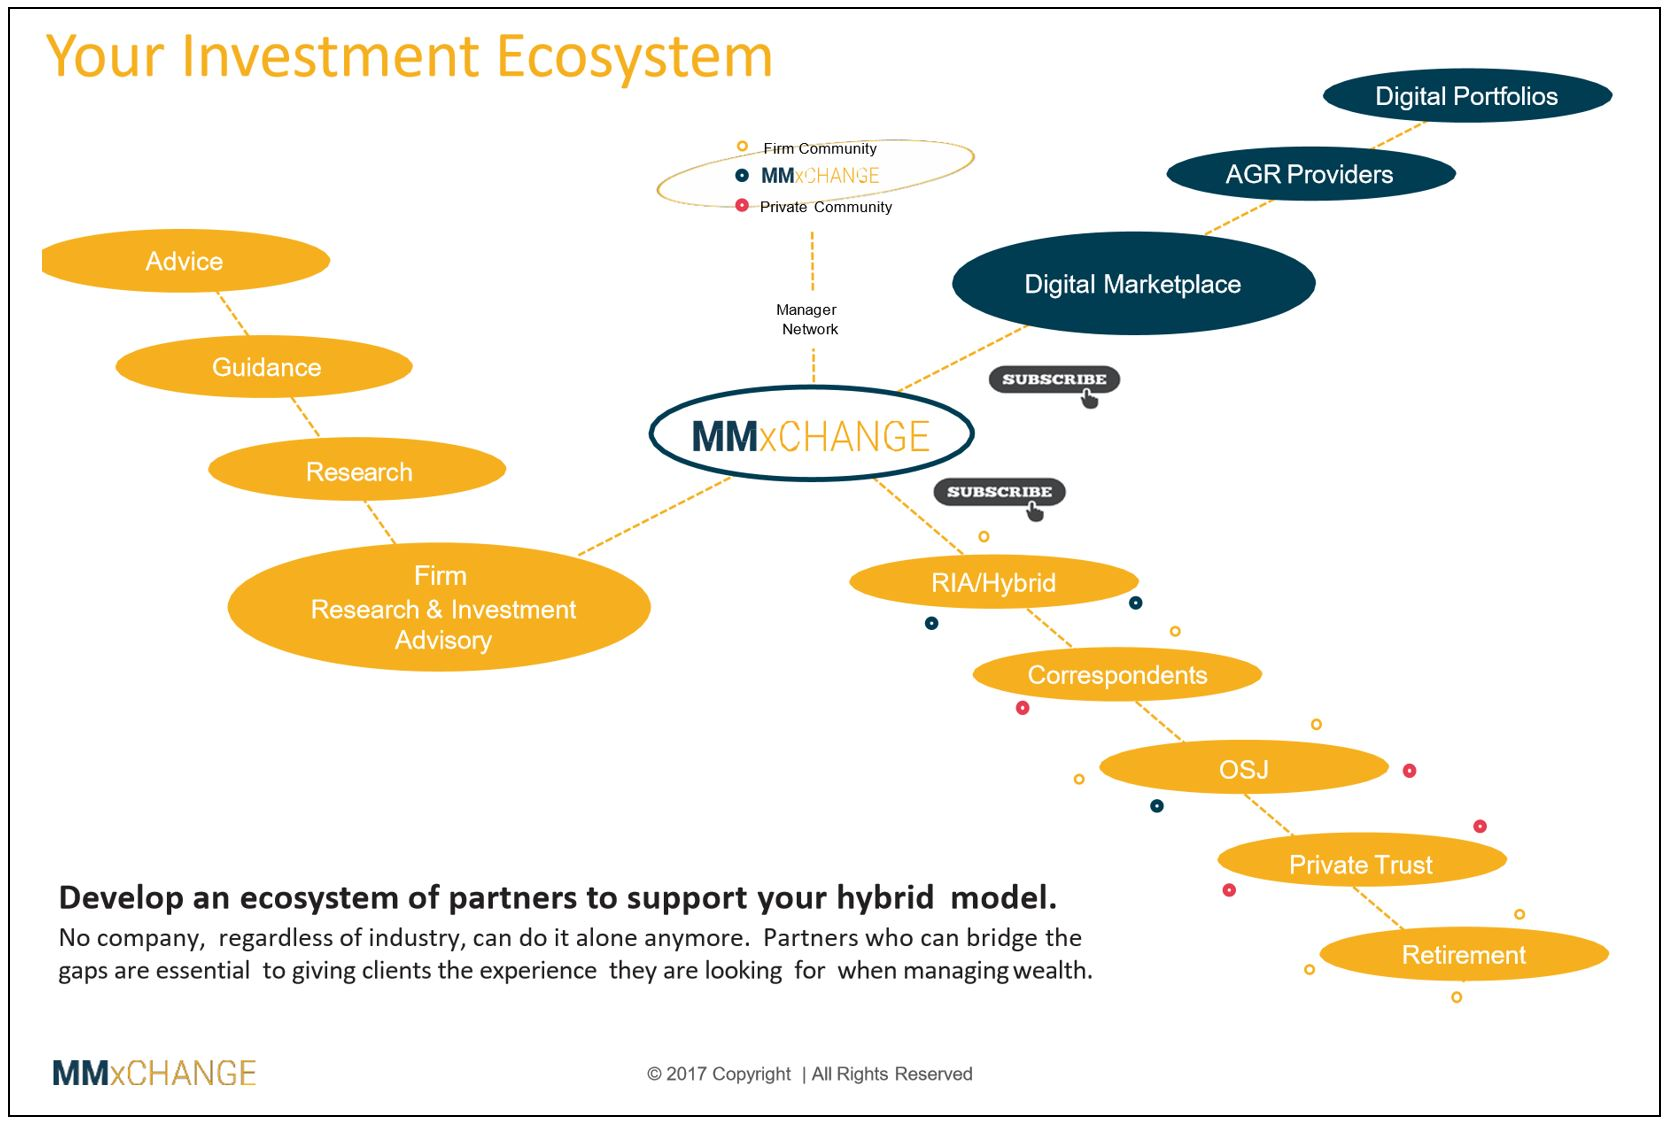 7 Model Hubs Battle for SMA Managers & Sponsors - Wealth